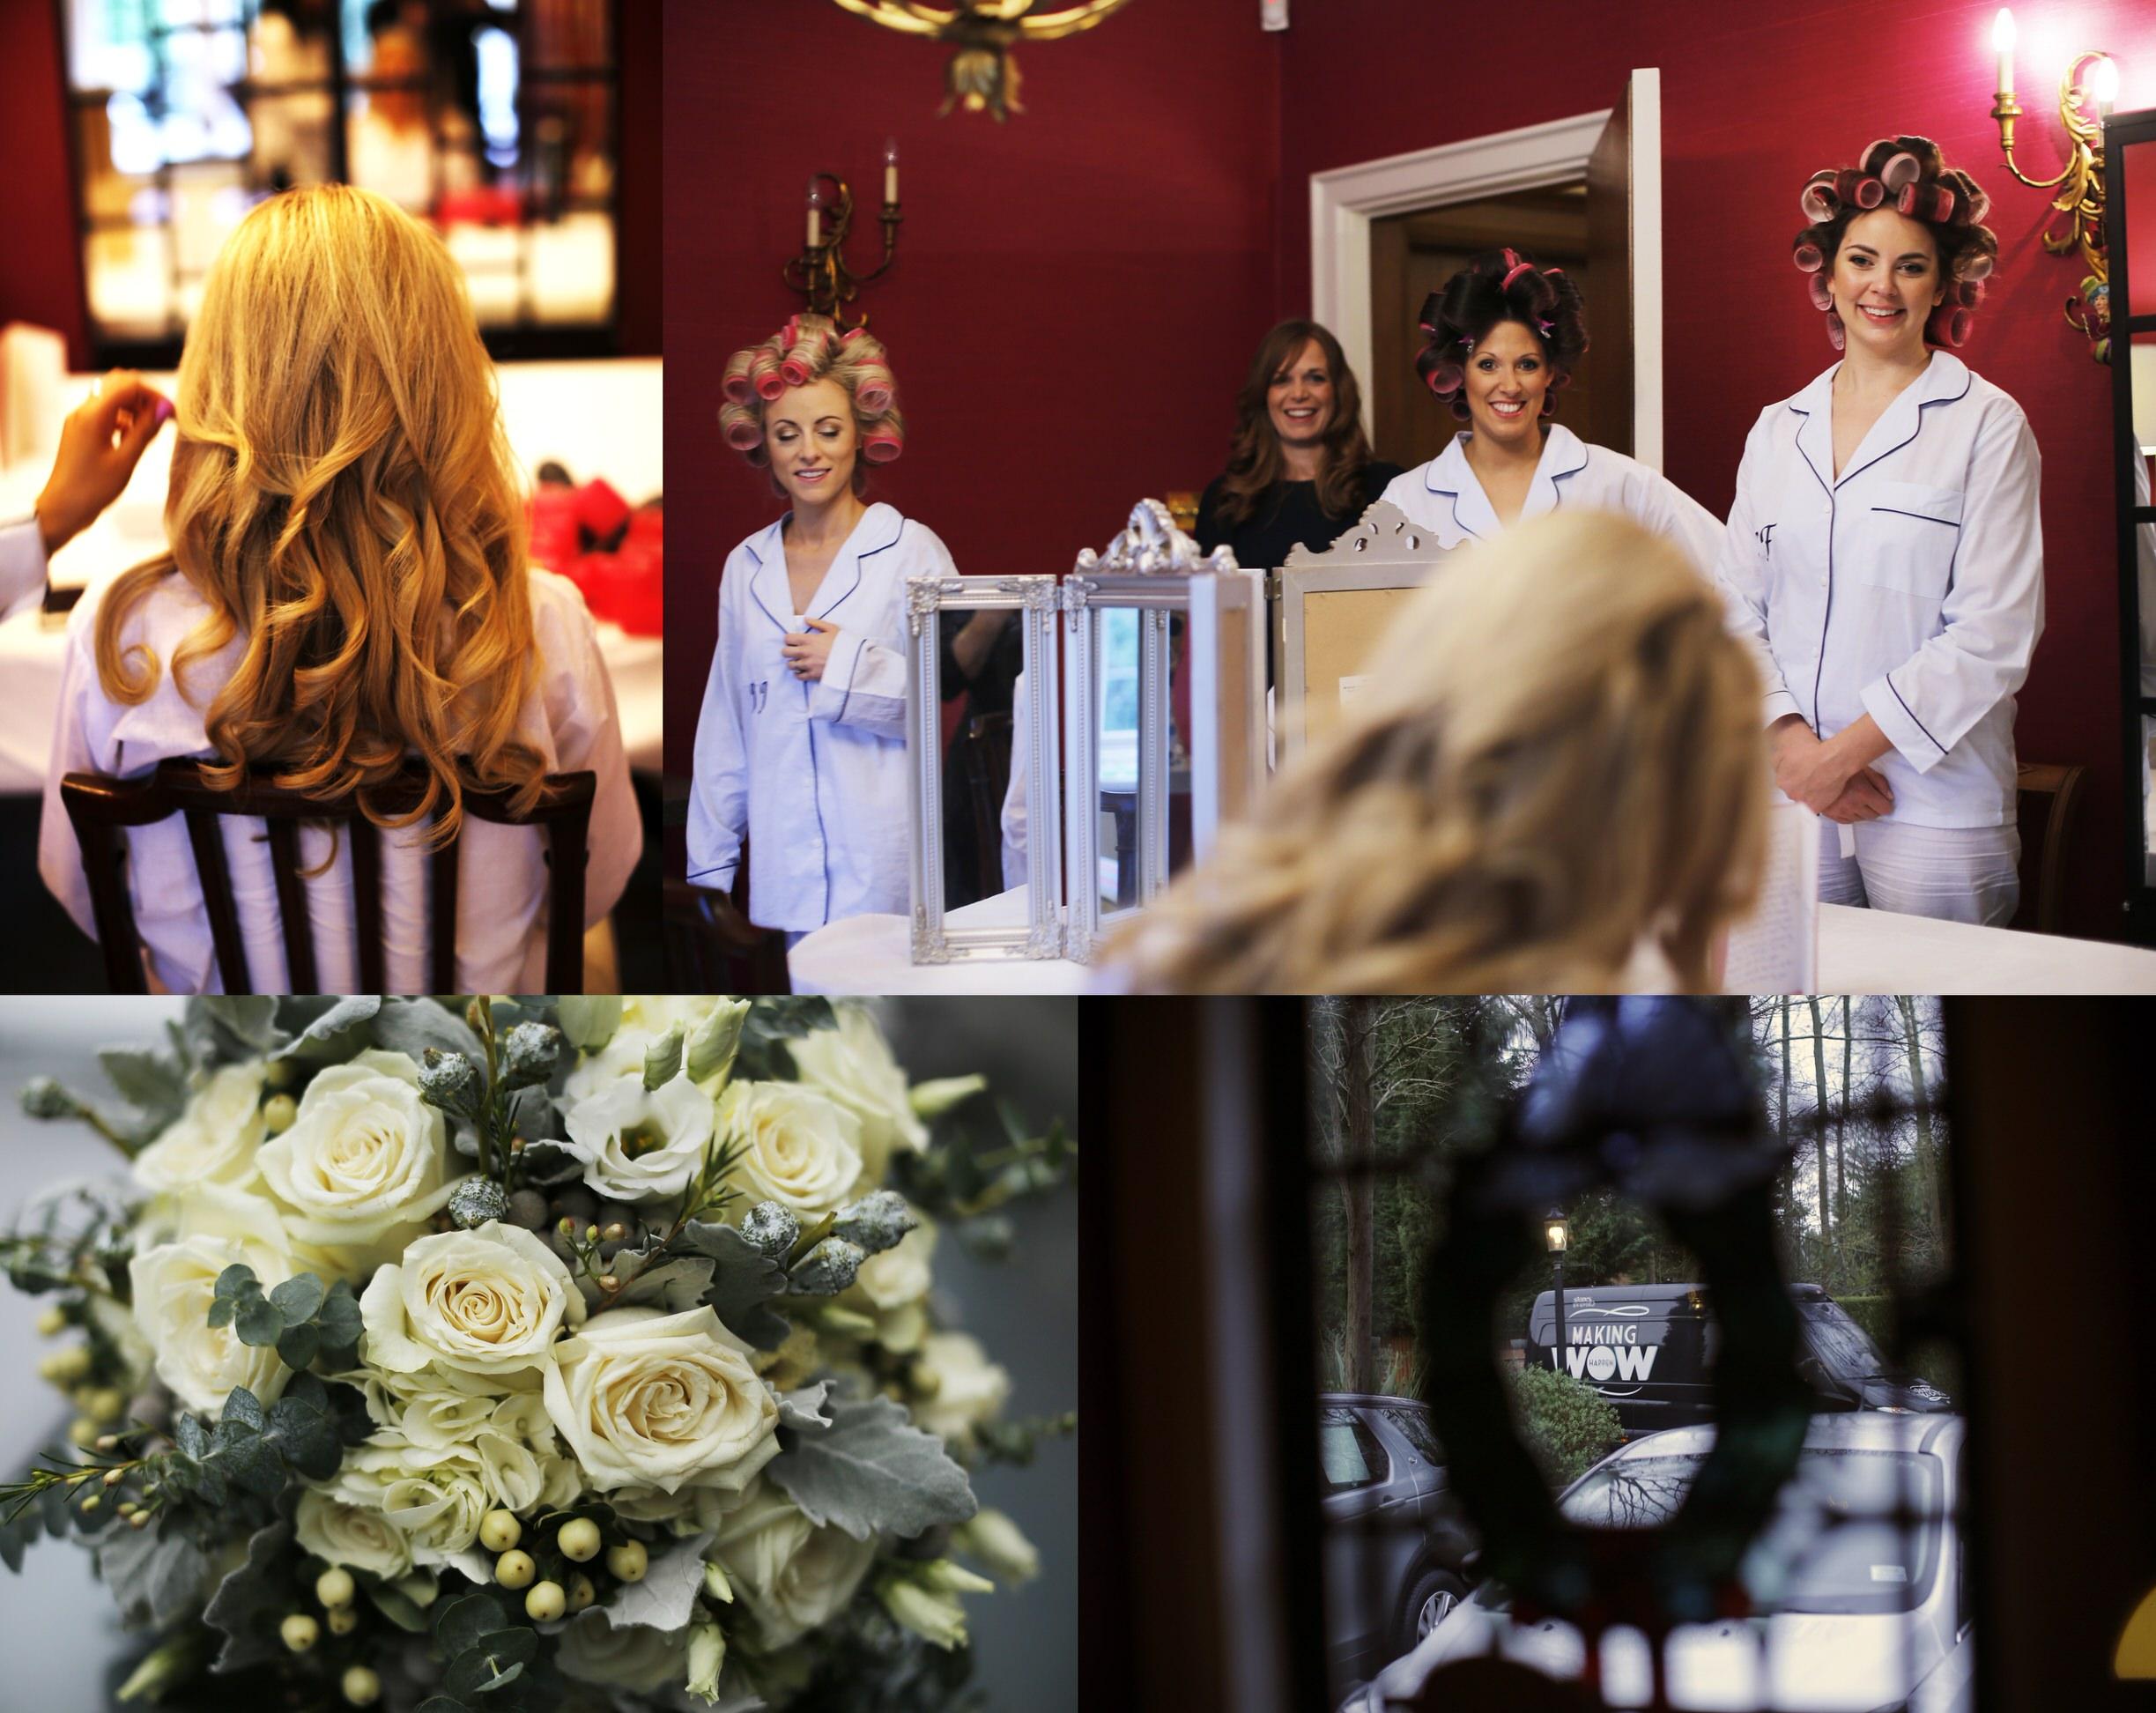 brett-harkness-winter-wedding-uk-wedding-photographer_0005.jpg